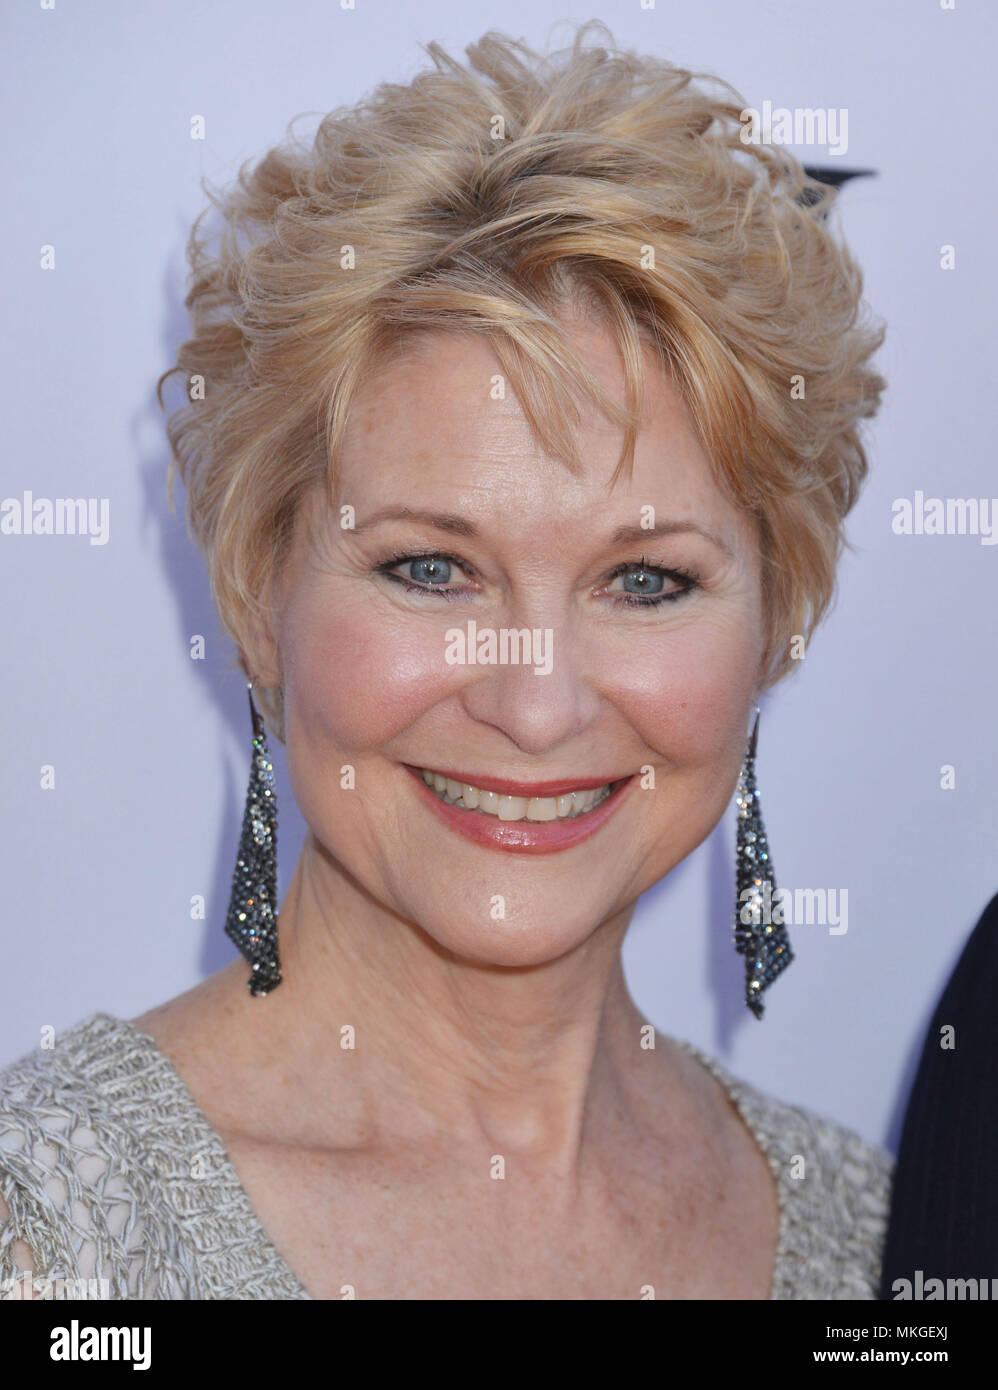 Charlotte Church (born 1986) Hot video Catherine Hicks born August 6, 1951 (age 67),Marisa Del Frate